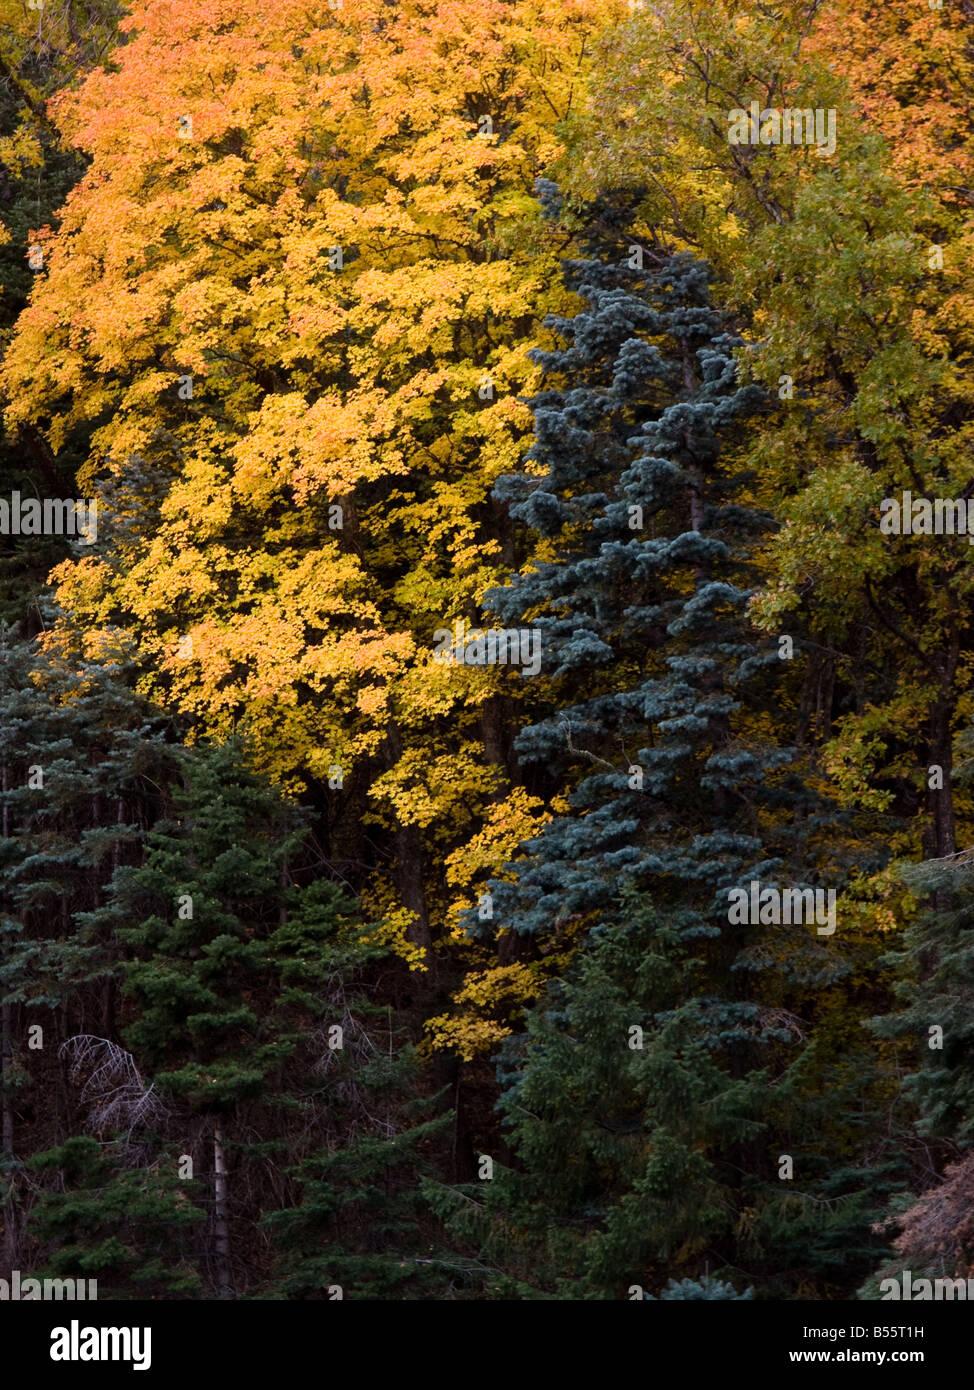 maples and douglas fir in pinaleno mountains, arizona Stock Photo